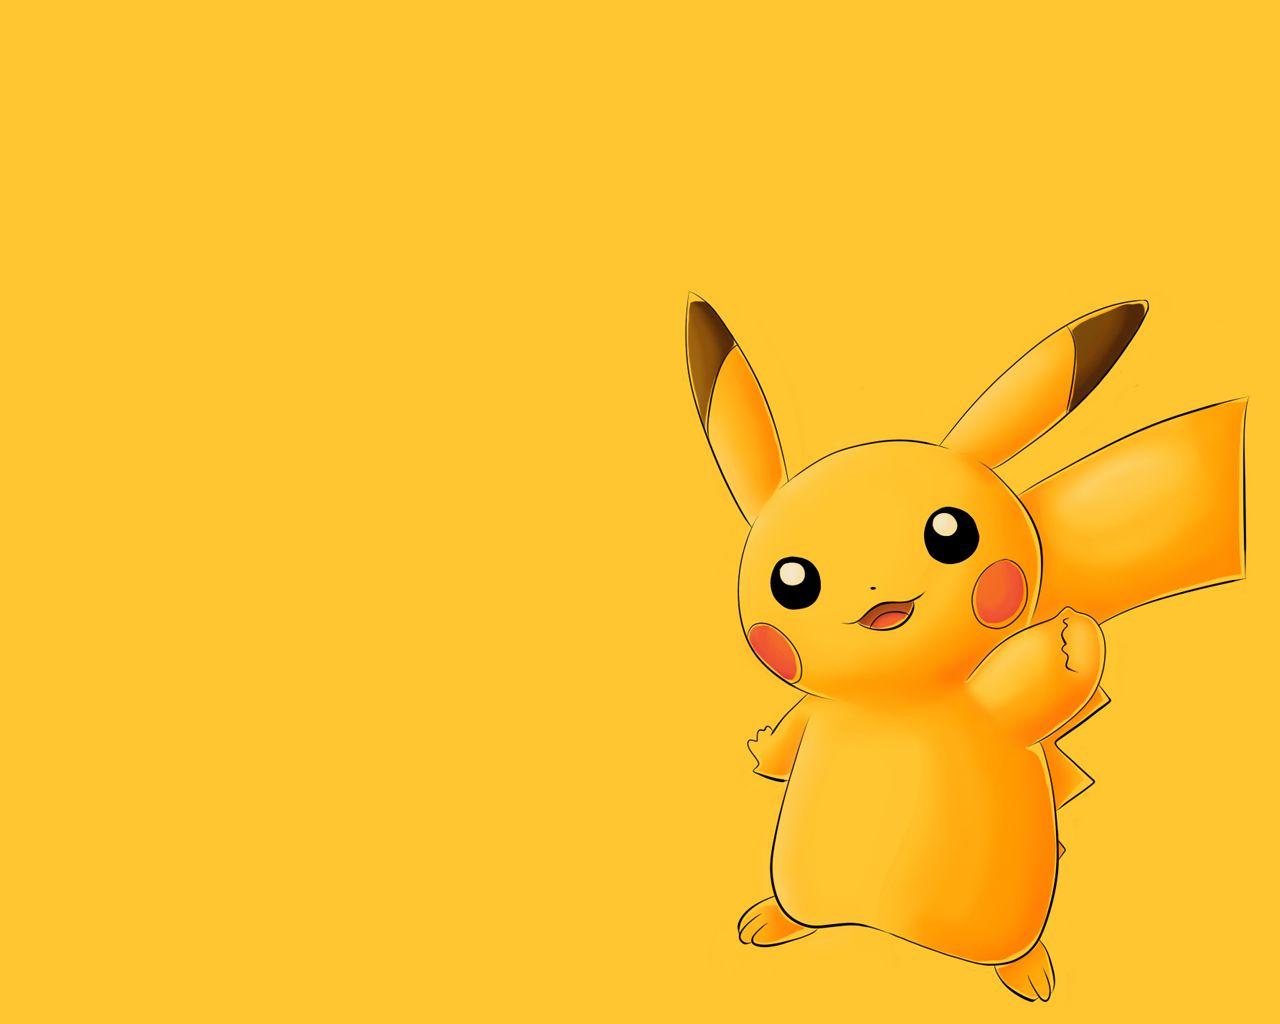 Cute Pikachu Wallpaper Pikachu Wallpaper Pikachu Cute Cartoon Wallpapers Cute anime pokemon wallpaper